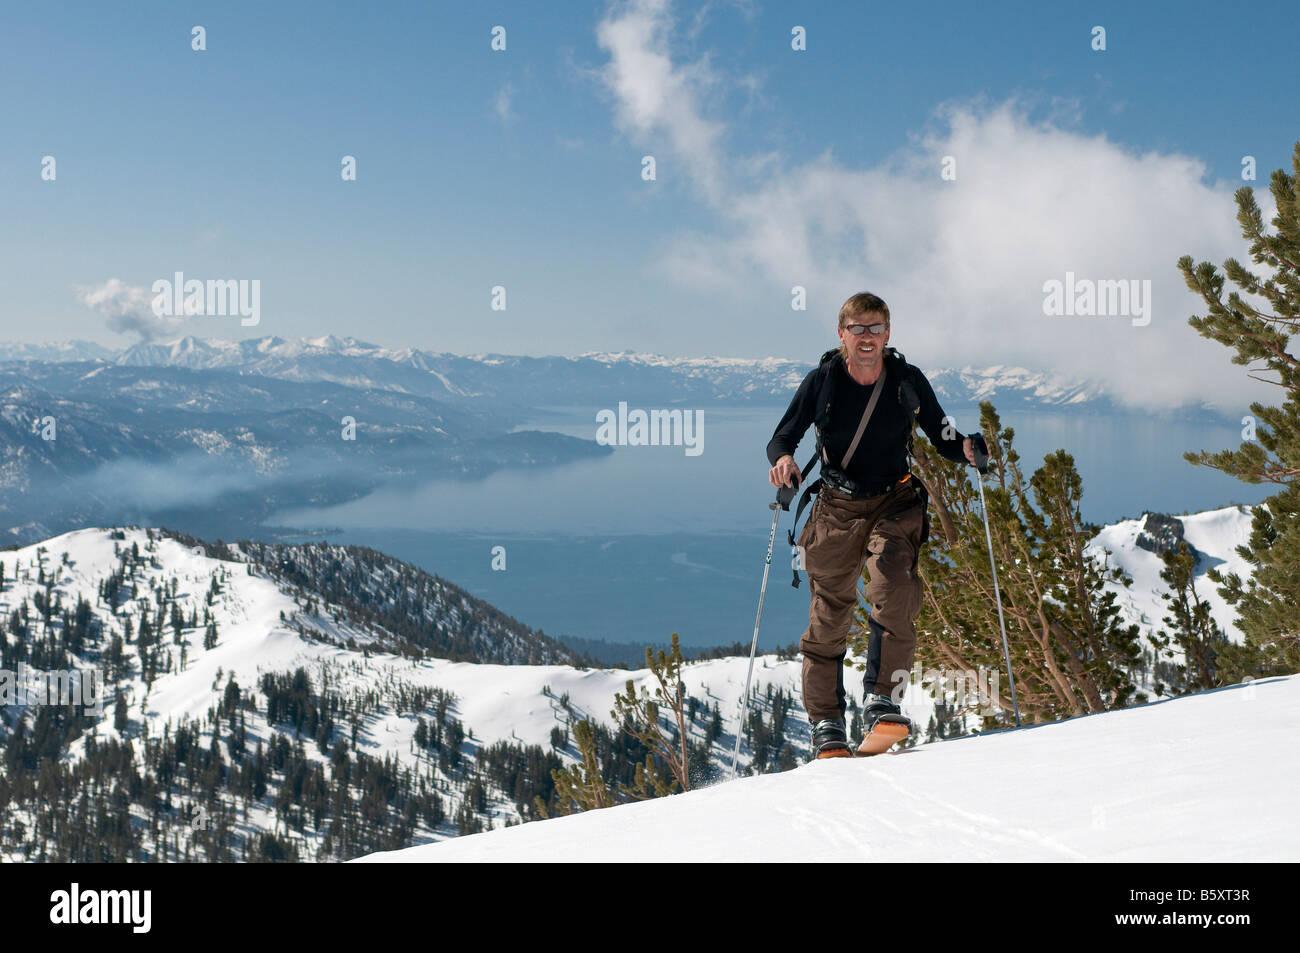 John Holleman above lake tahoe near Mt. Rose summit, Nevada, USA Stock Photo